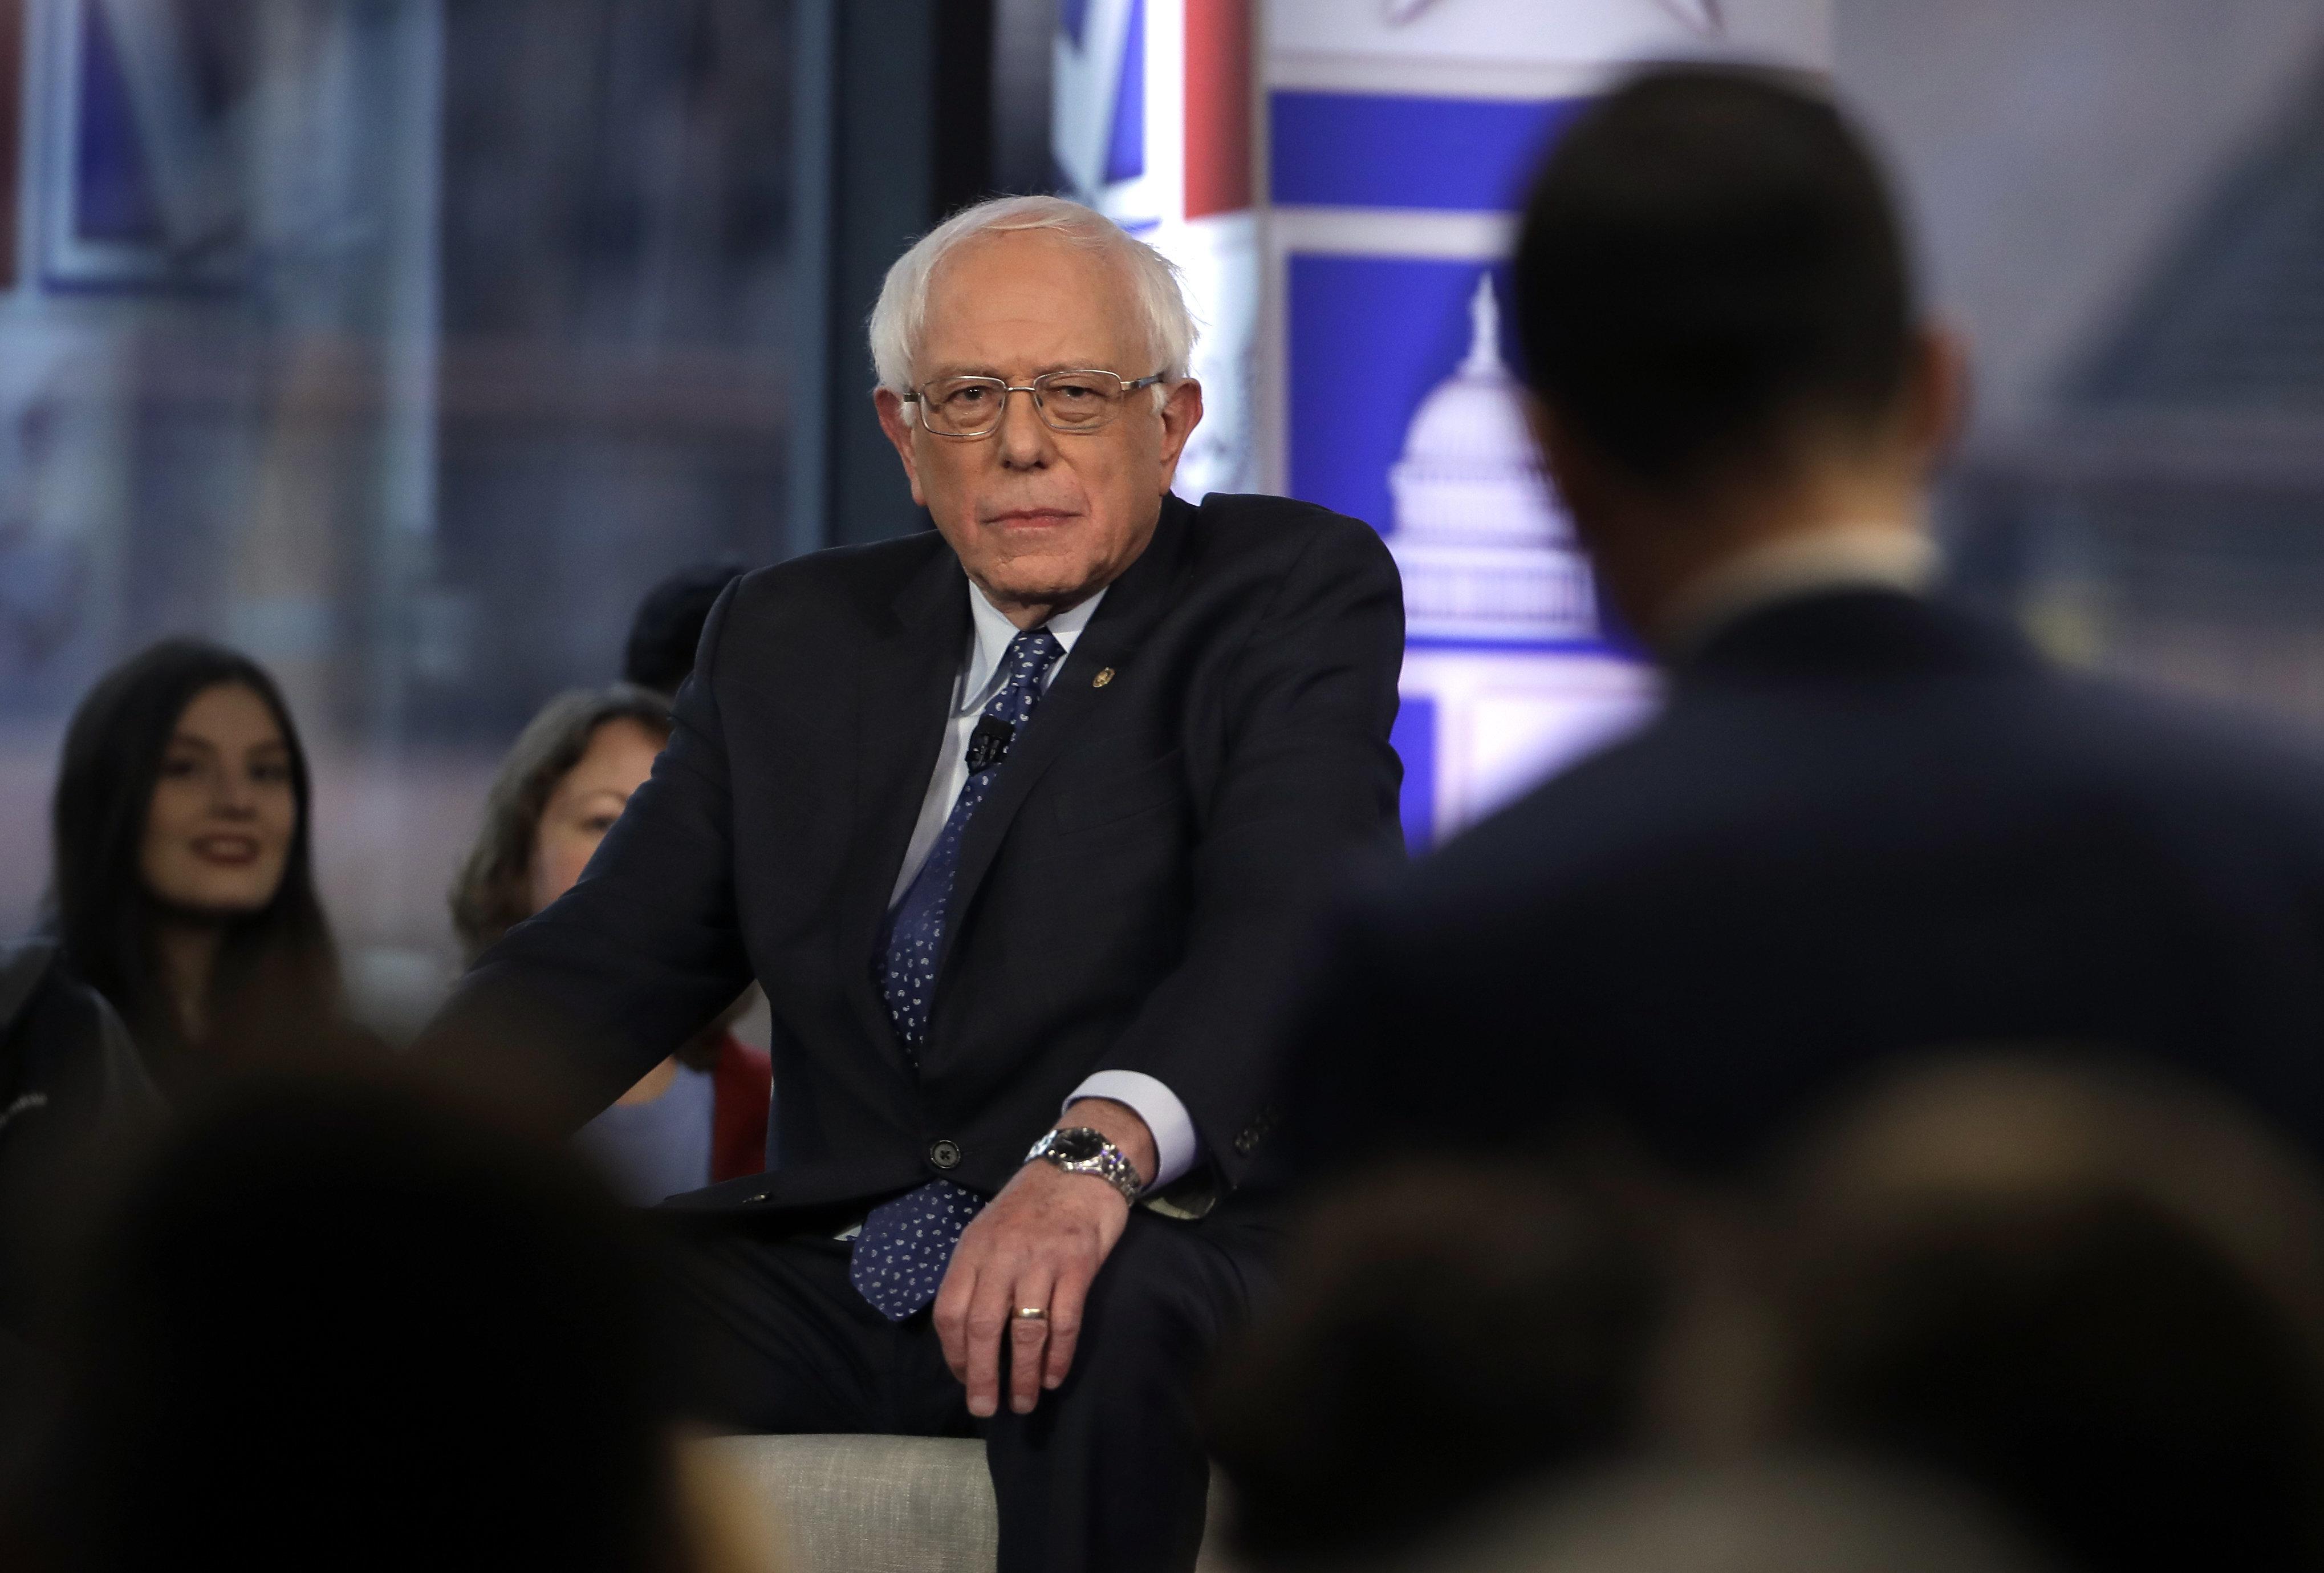 Bernie Sanders Says U.S. Should Build Migrant Facilities 'Right On The Border'